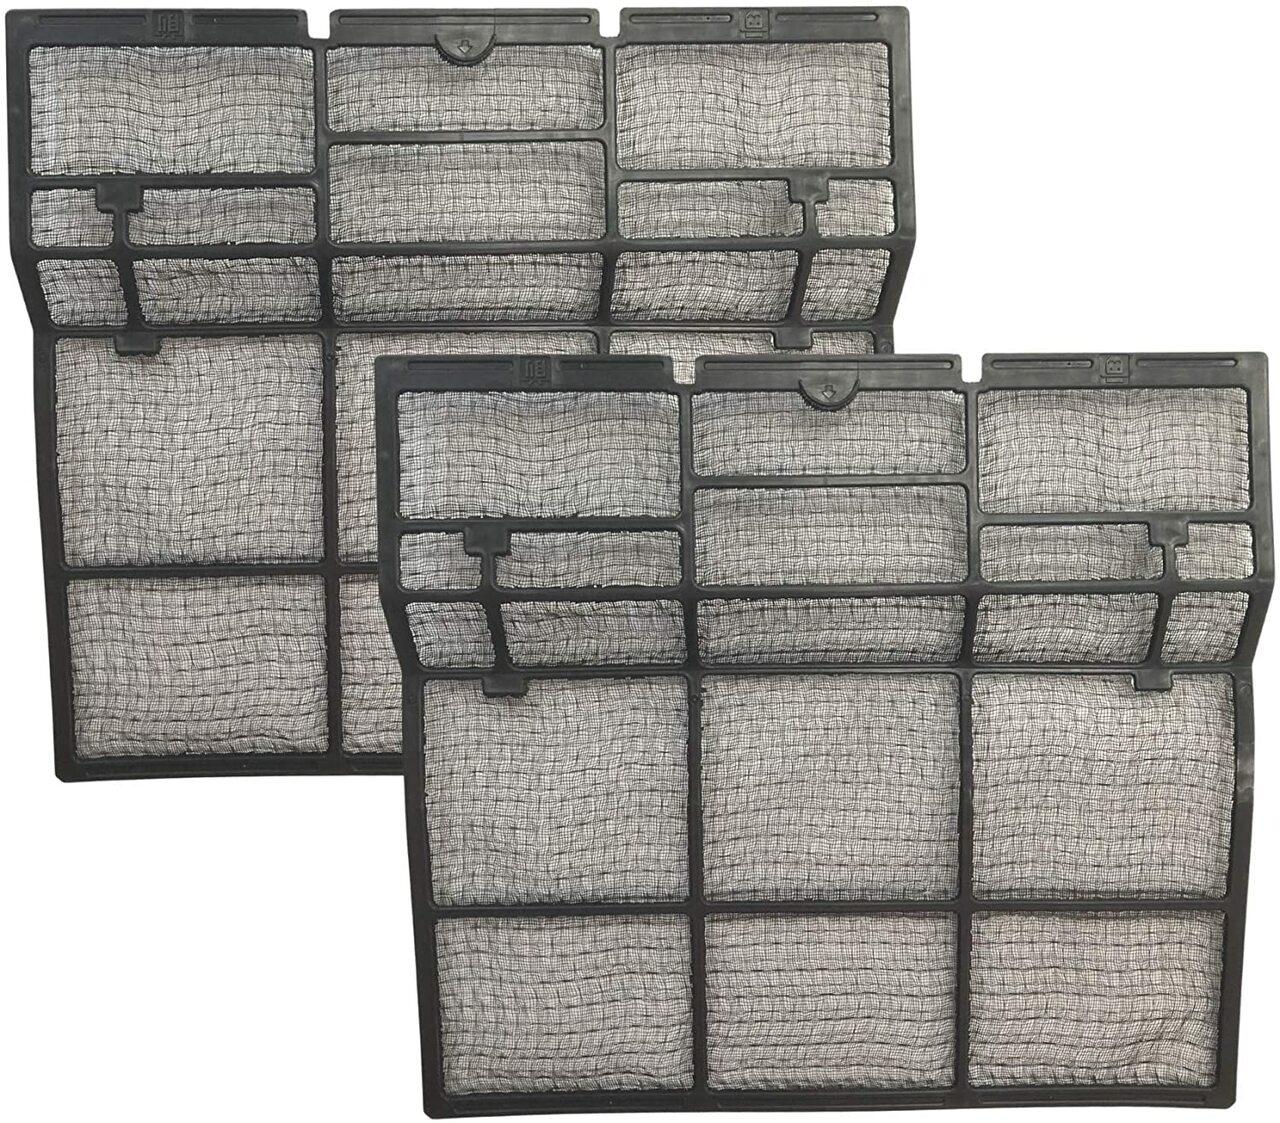 Daikin 1101038 Standard Replacement Air Filters - 2 Pack